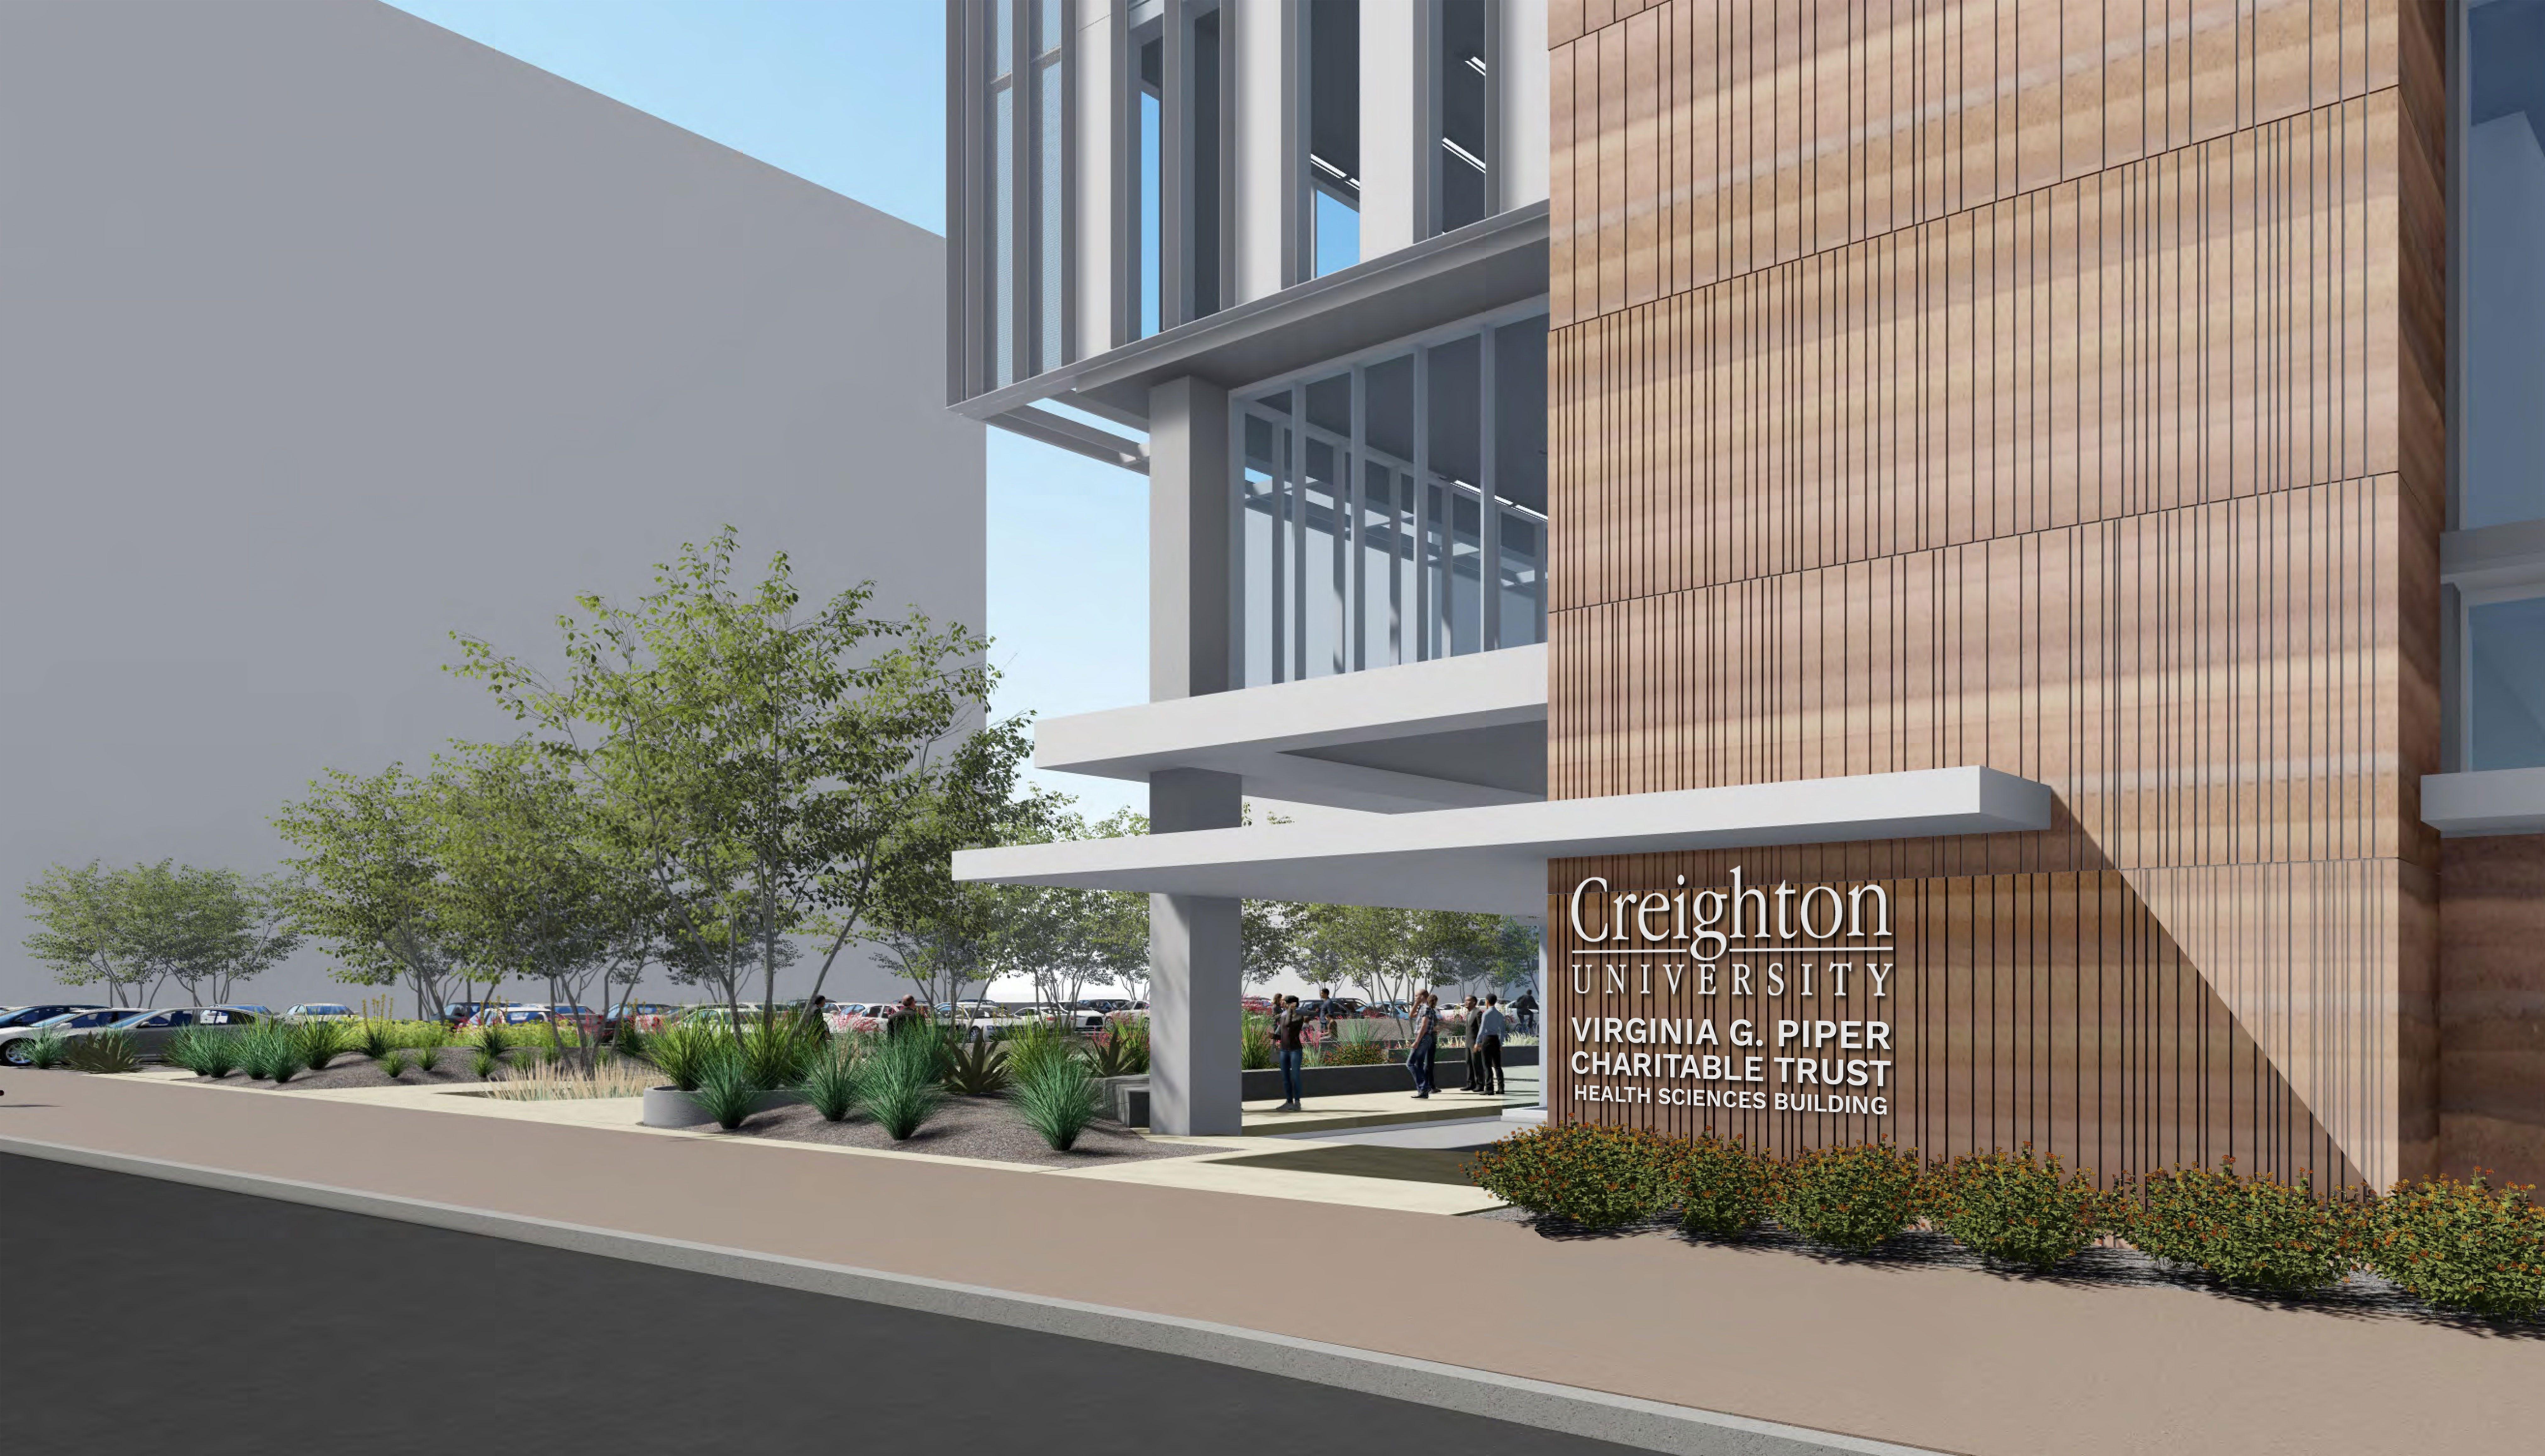 Creighton University and ASU to partner on health programs